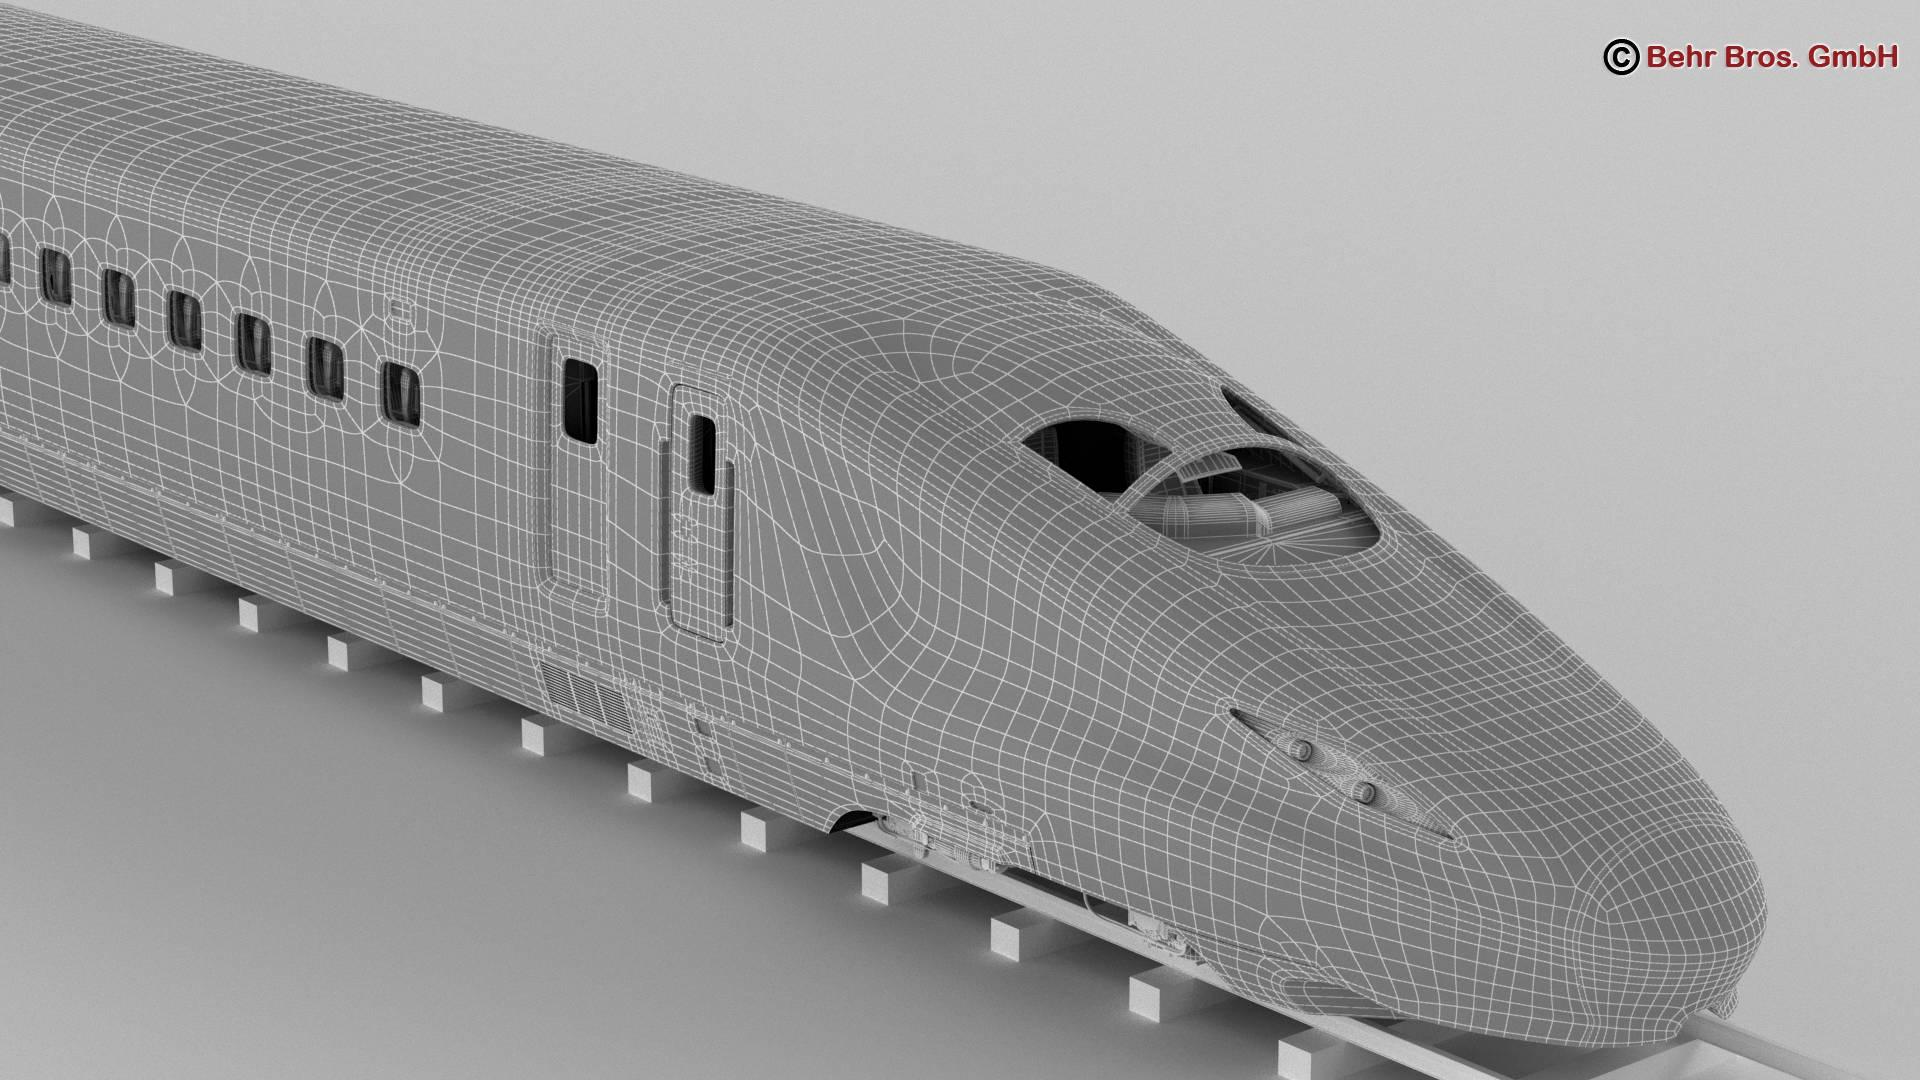 shinkansen e7 3d model 3ds max fbx c4d lwo ma mb obj 265668